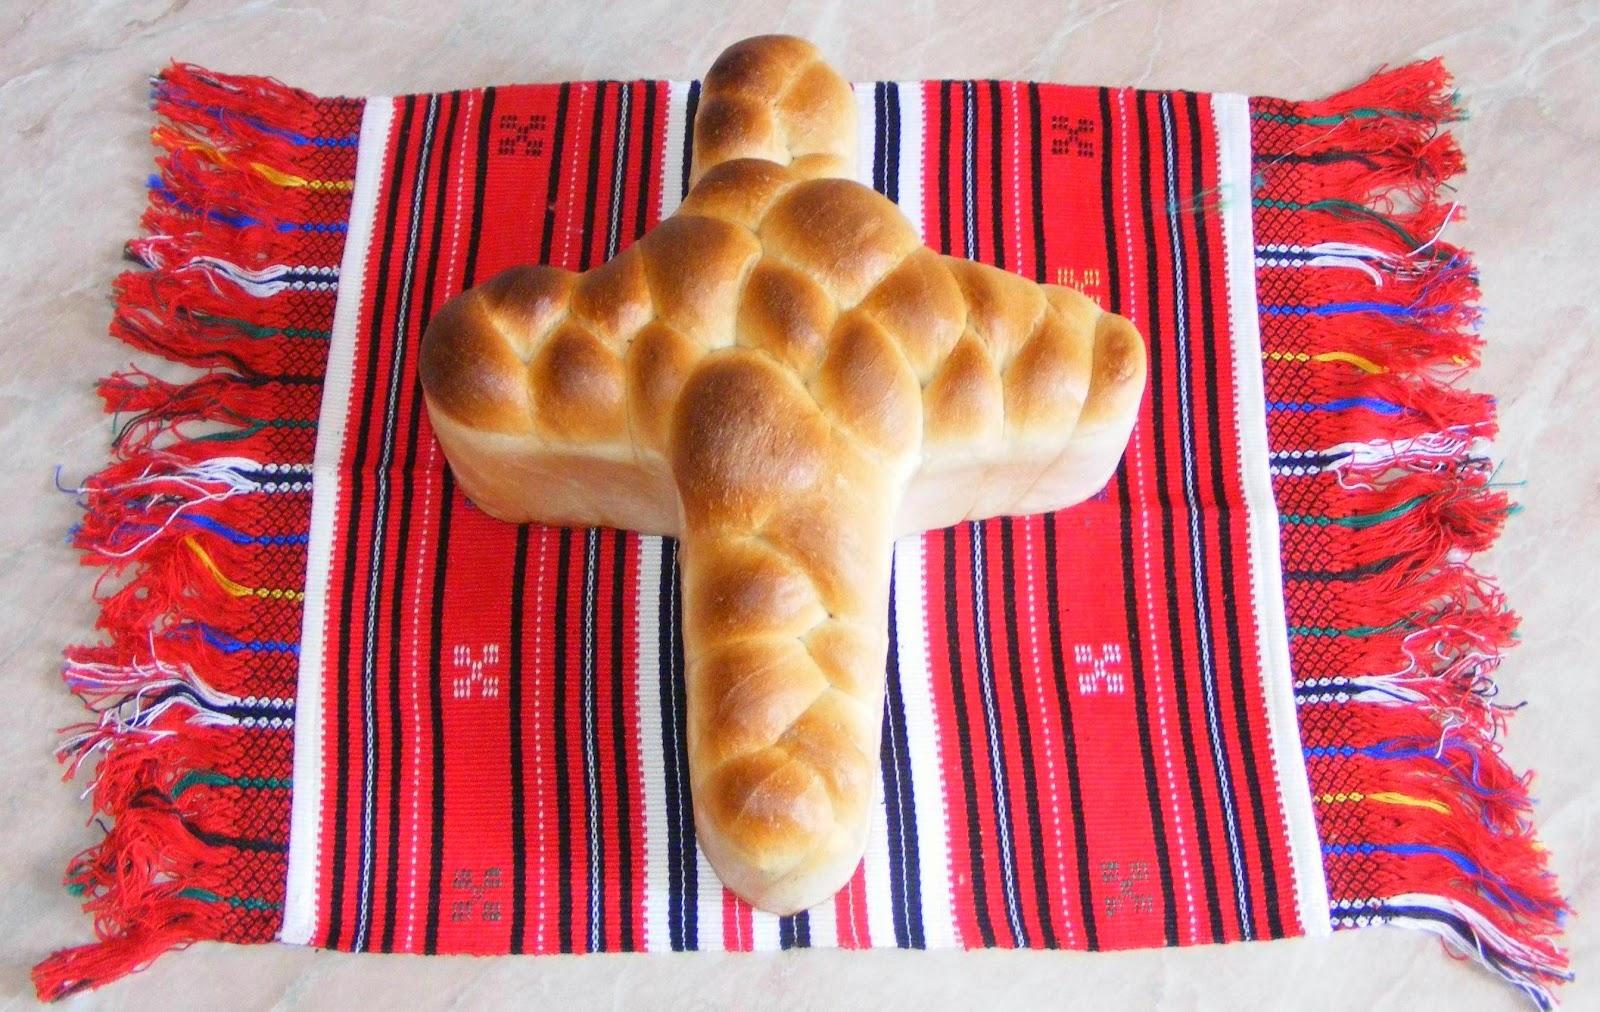 cruce din aluat de paine, retete si preparate culinare cruce din aluat de paine pentru parastas, reteta paine impletita de casa, paine si impletite de casa, retete de post,